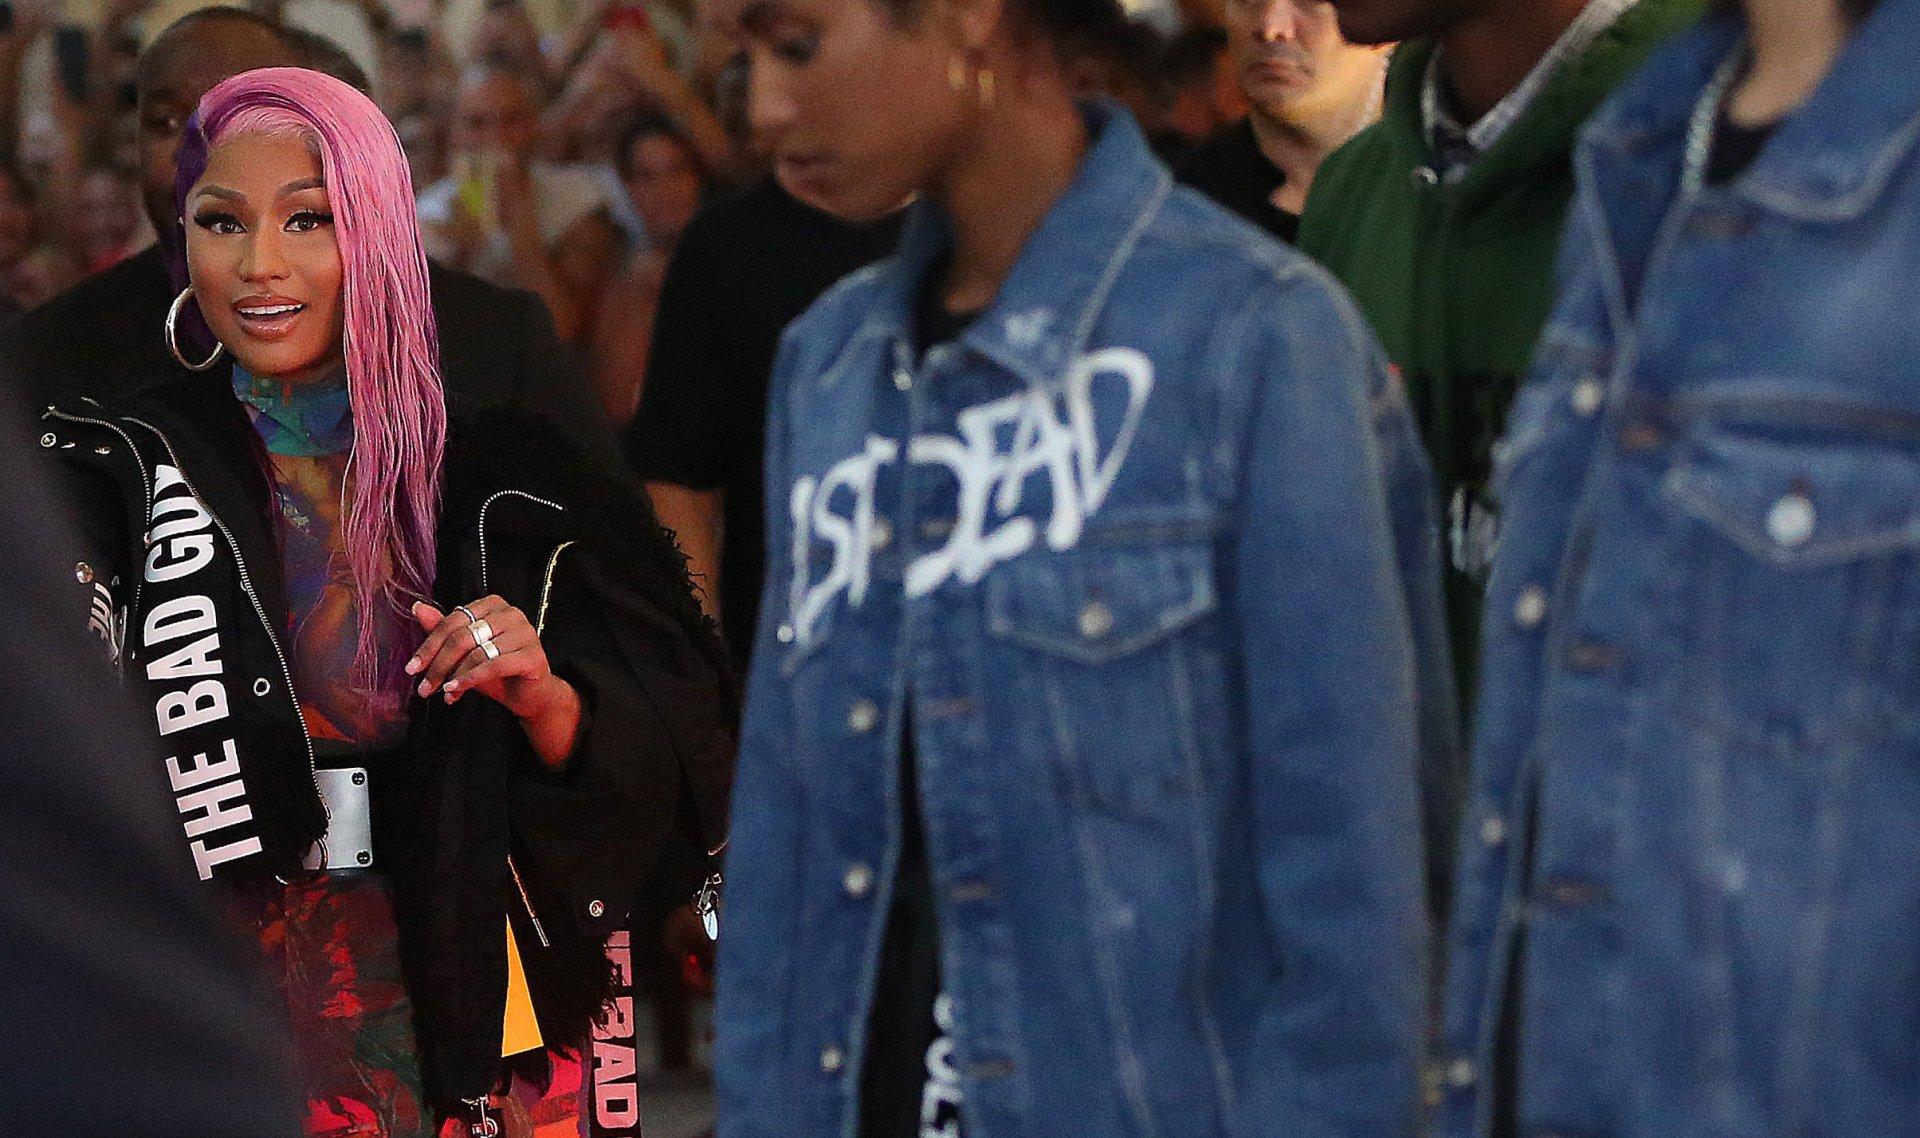 Nicki-Minaj-See-Through-TheFappeningBlog.com-55.jpg